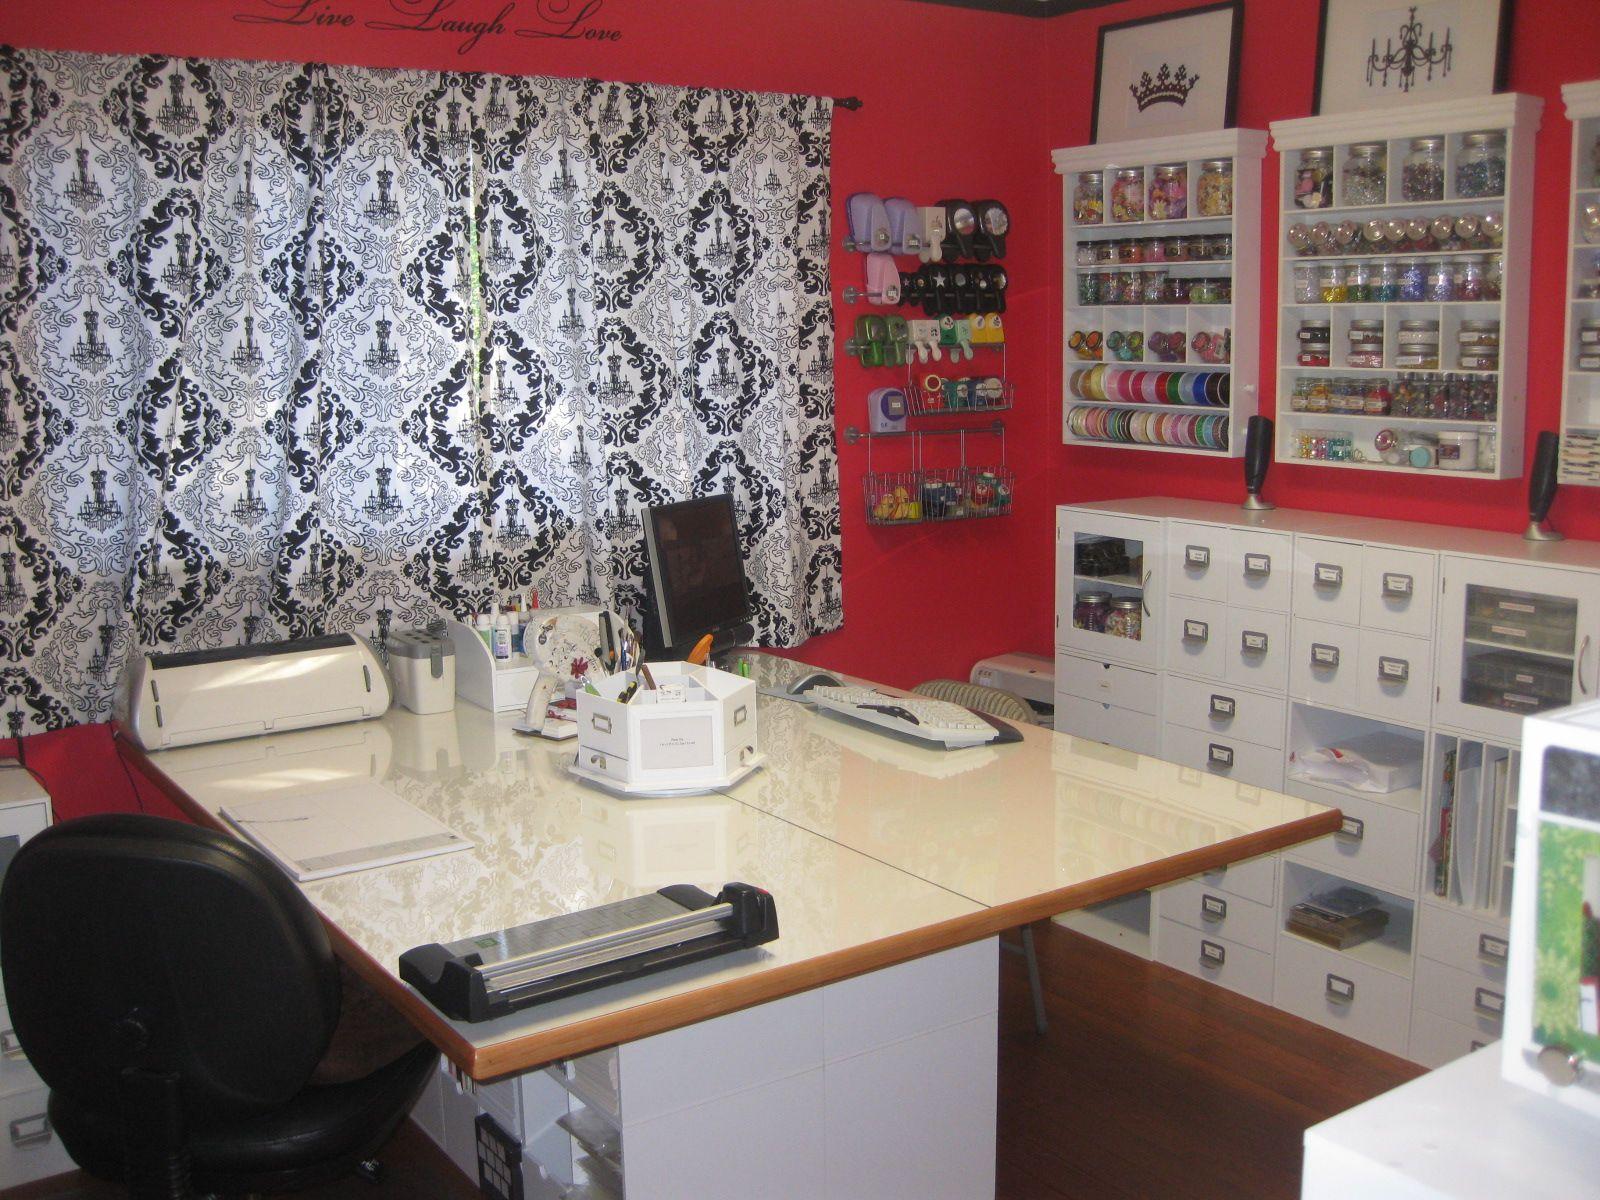 Craft/Scrapbooking Room - Like the small shelf for computer/cricut ...